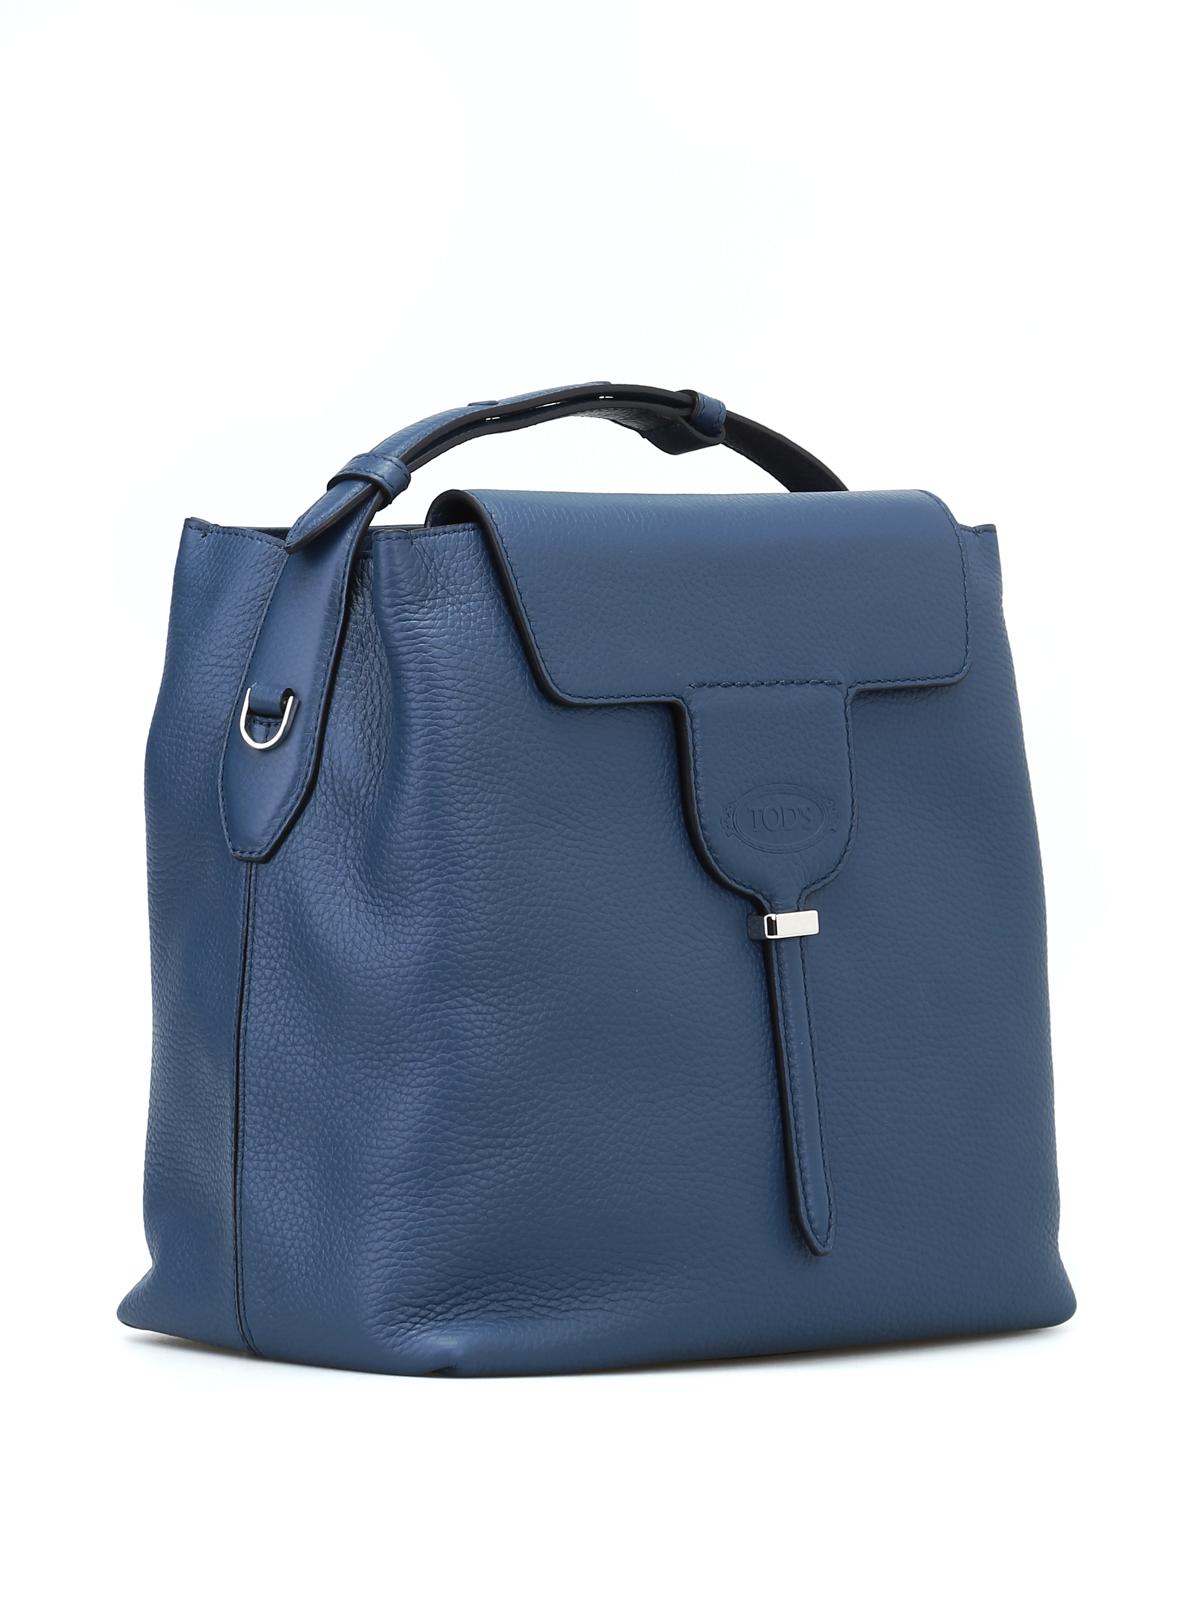 aef4e42d9 Tod'S - Joy small ocean blue grain leather bag - Bucket bags ...